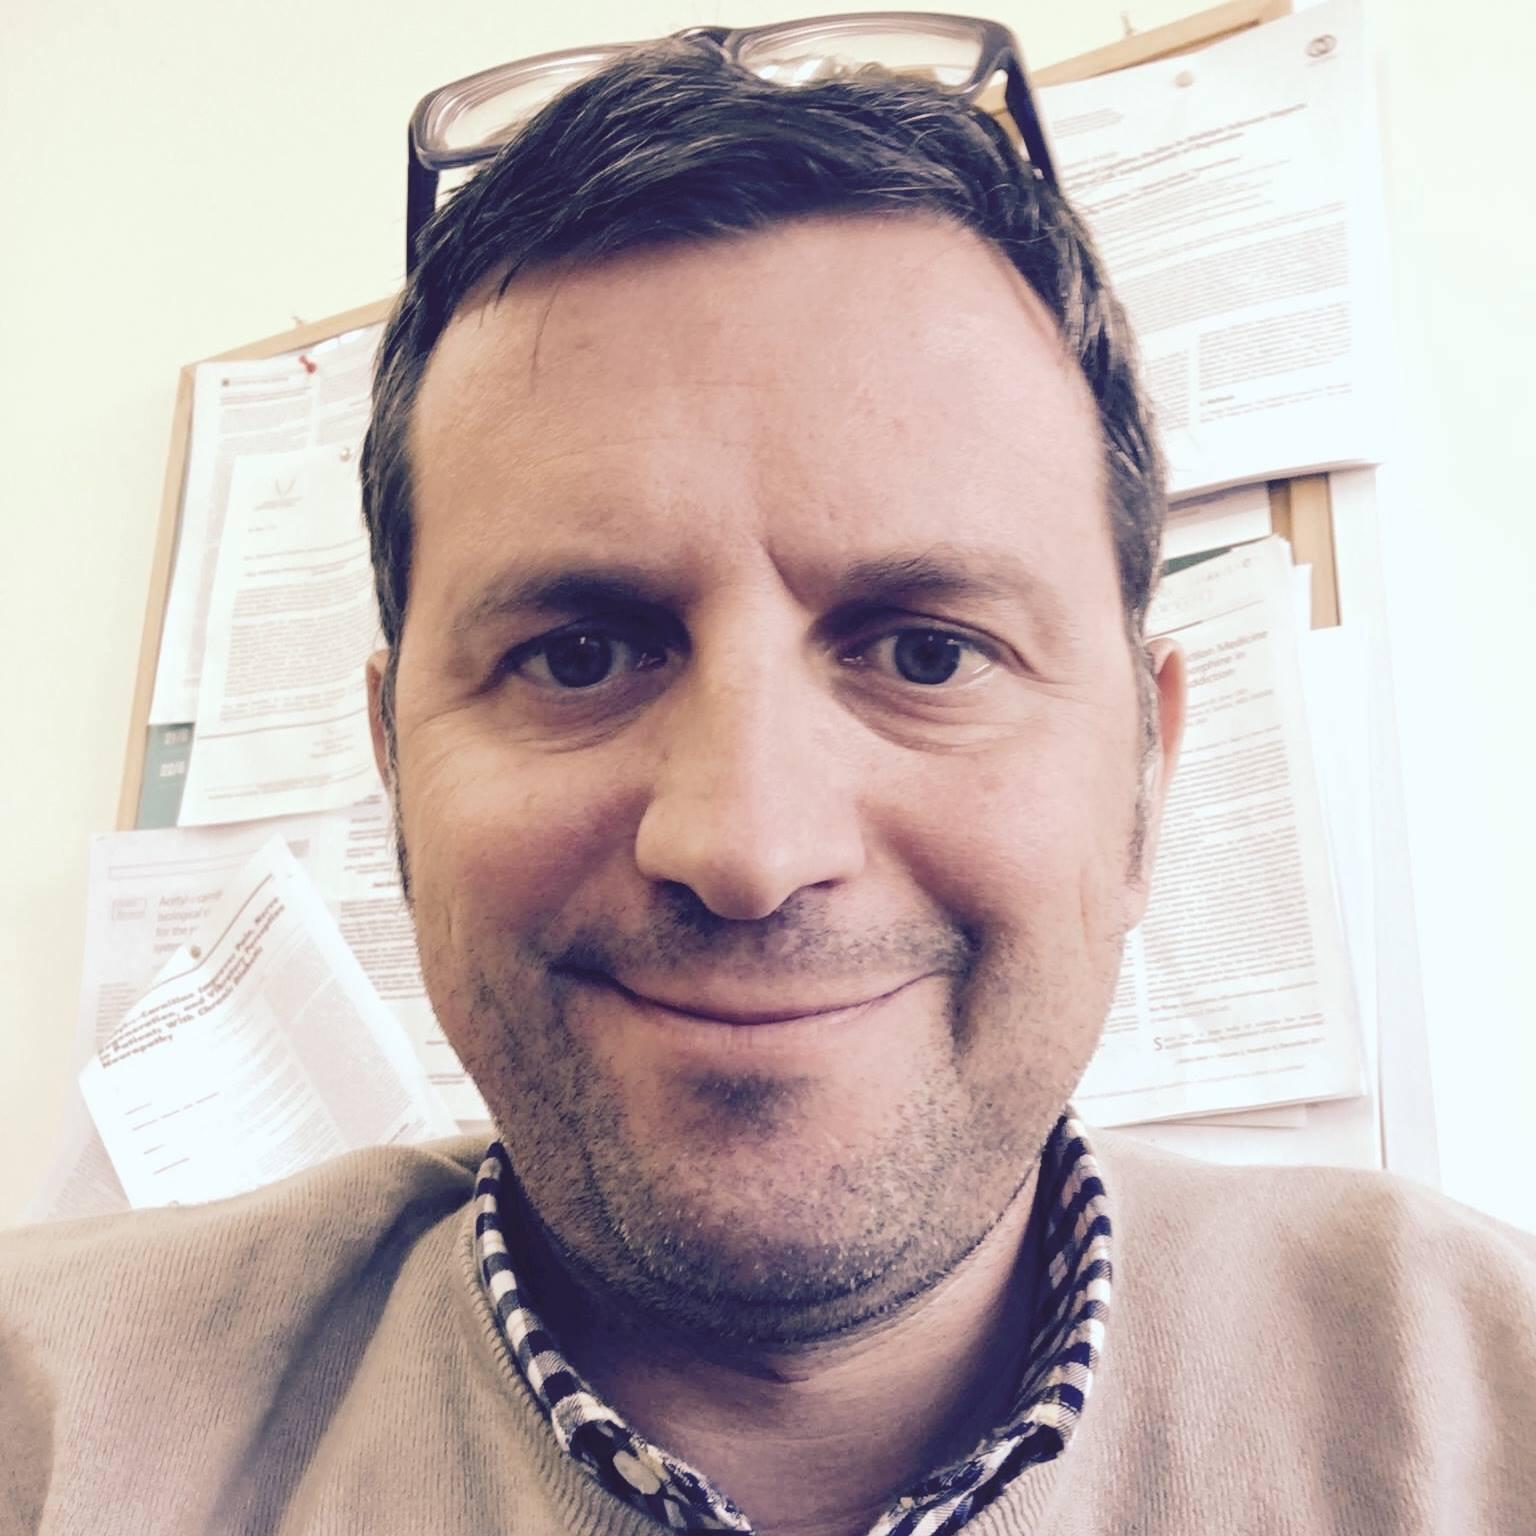 Dr. Lampos Samartzis